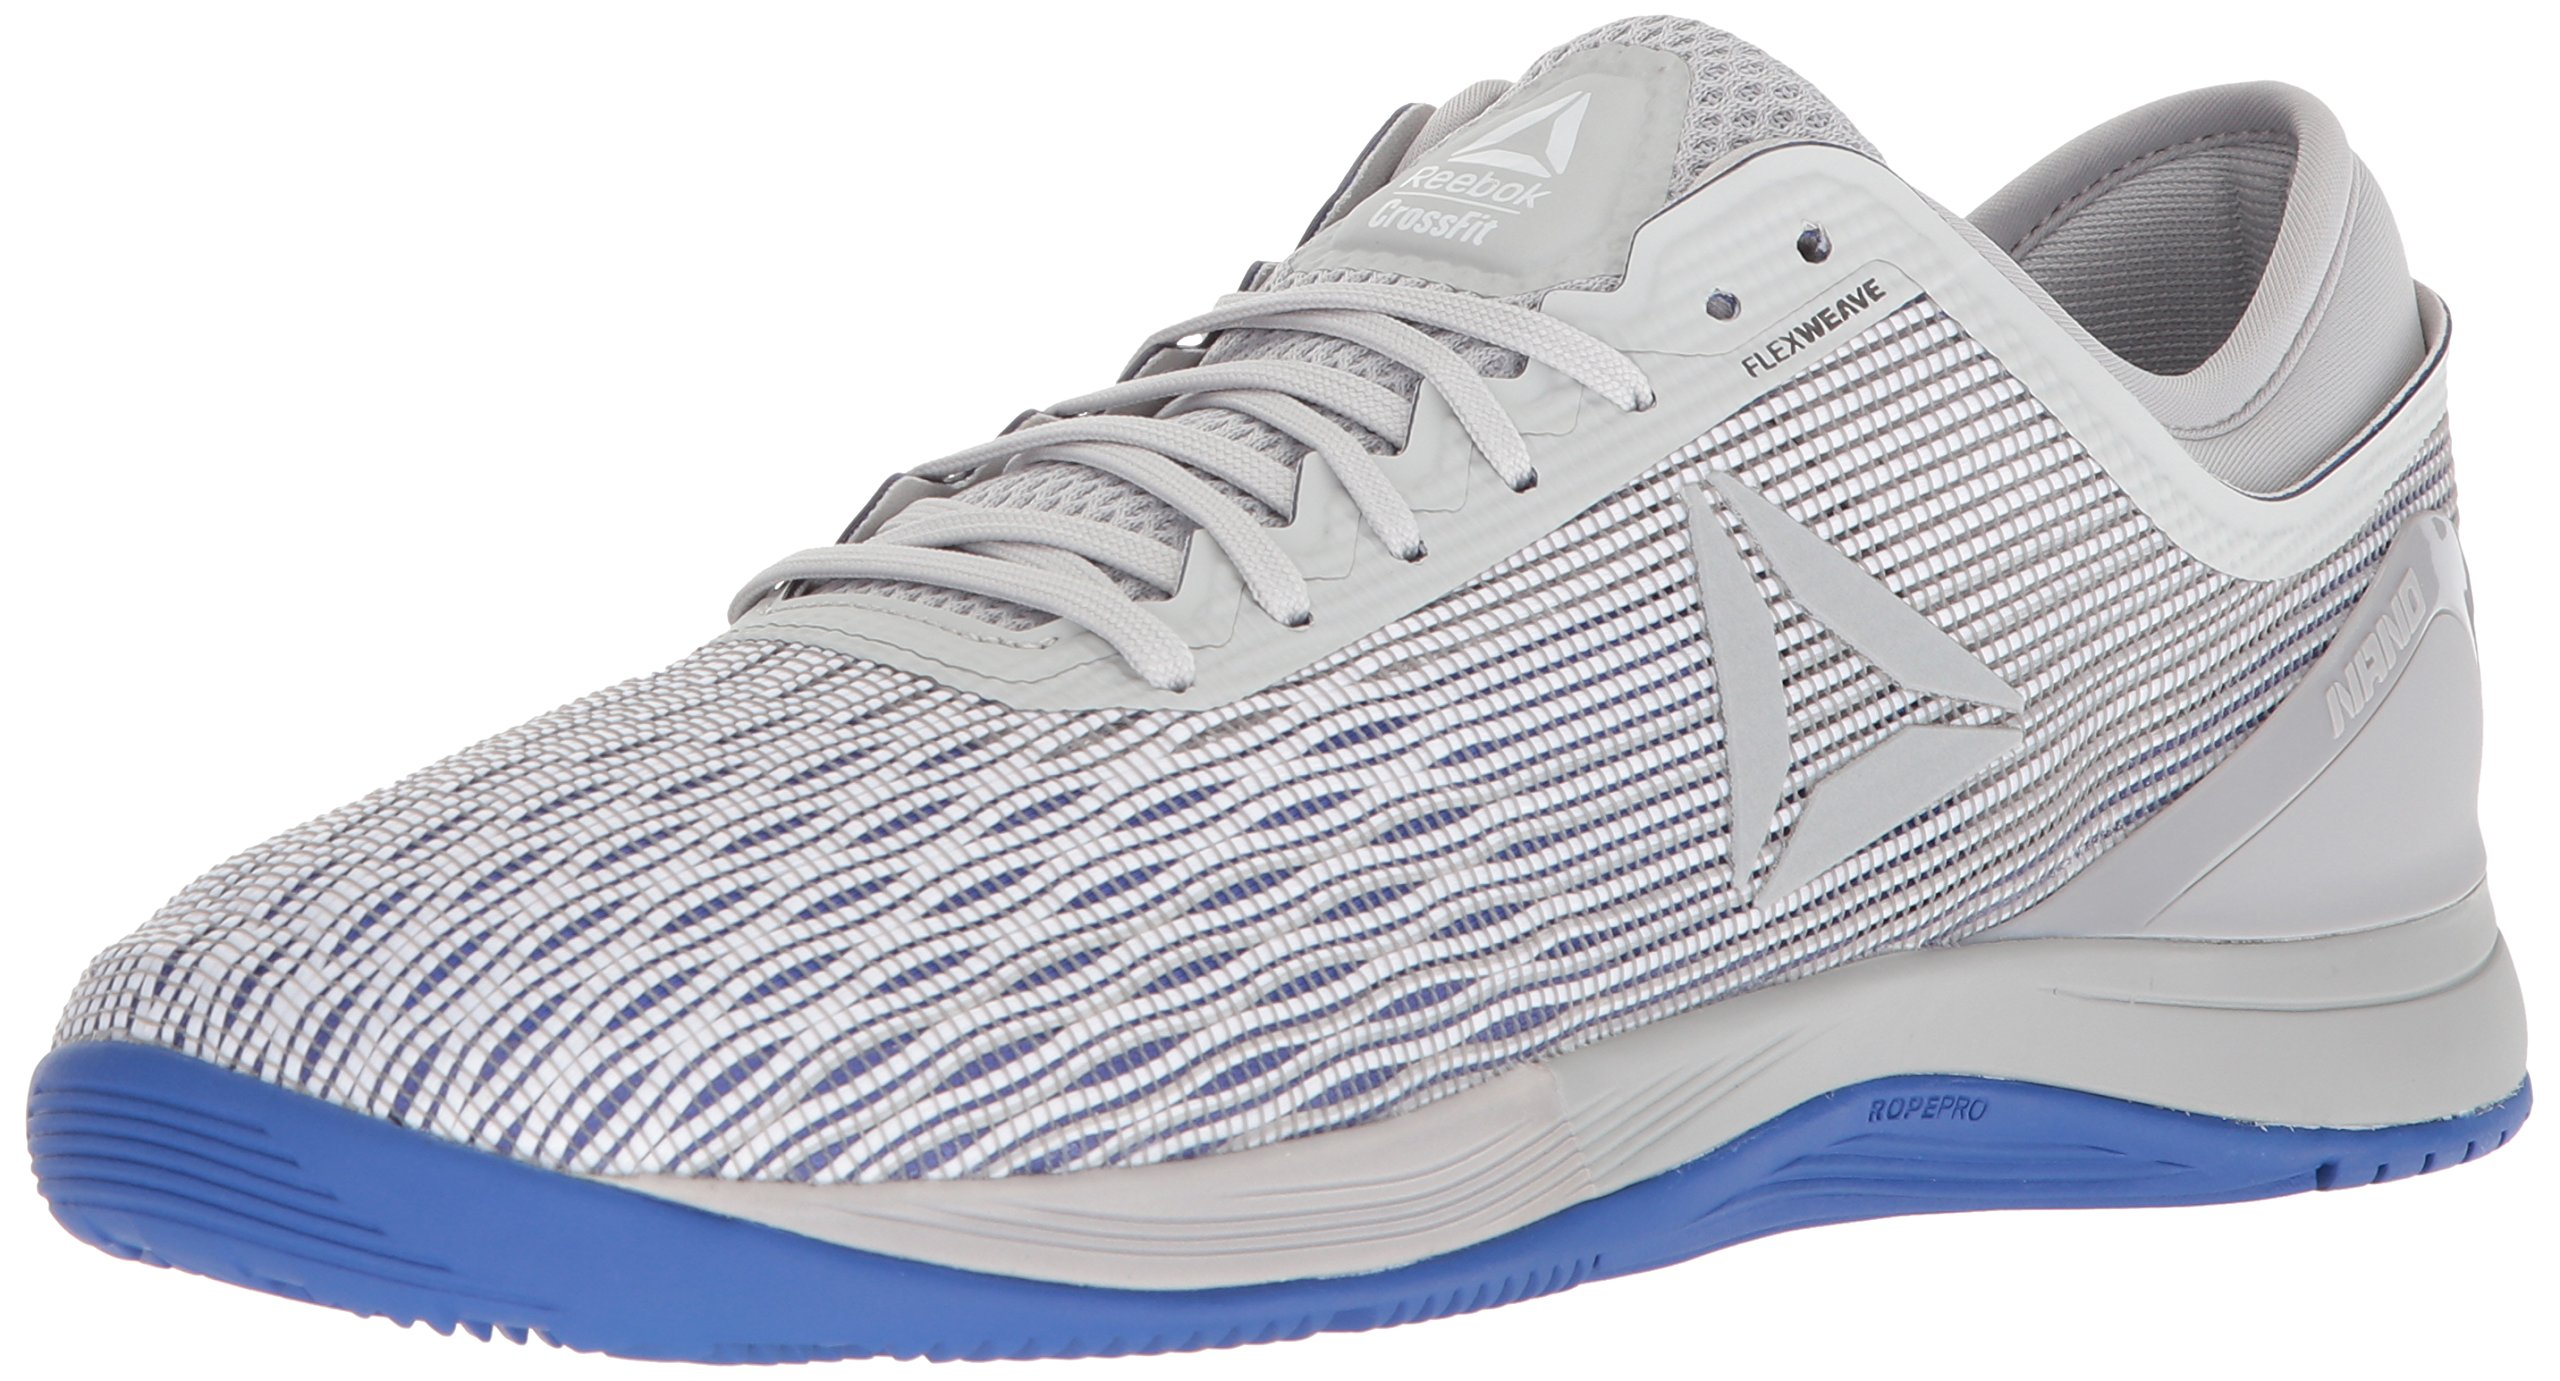 Reebok Men's CROSSFIT Nano 8.0 Sneaker, White/Stark Grey/Skull GR, 6.5 M US by Reebok (Image #1)